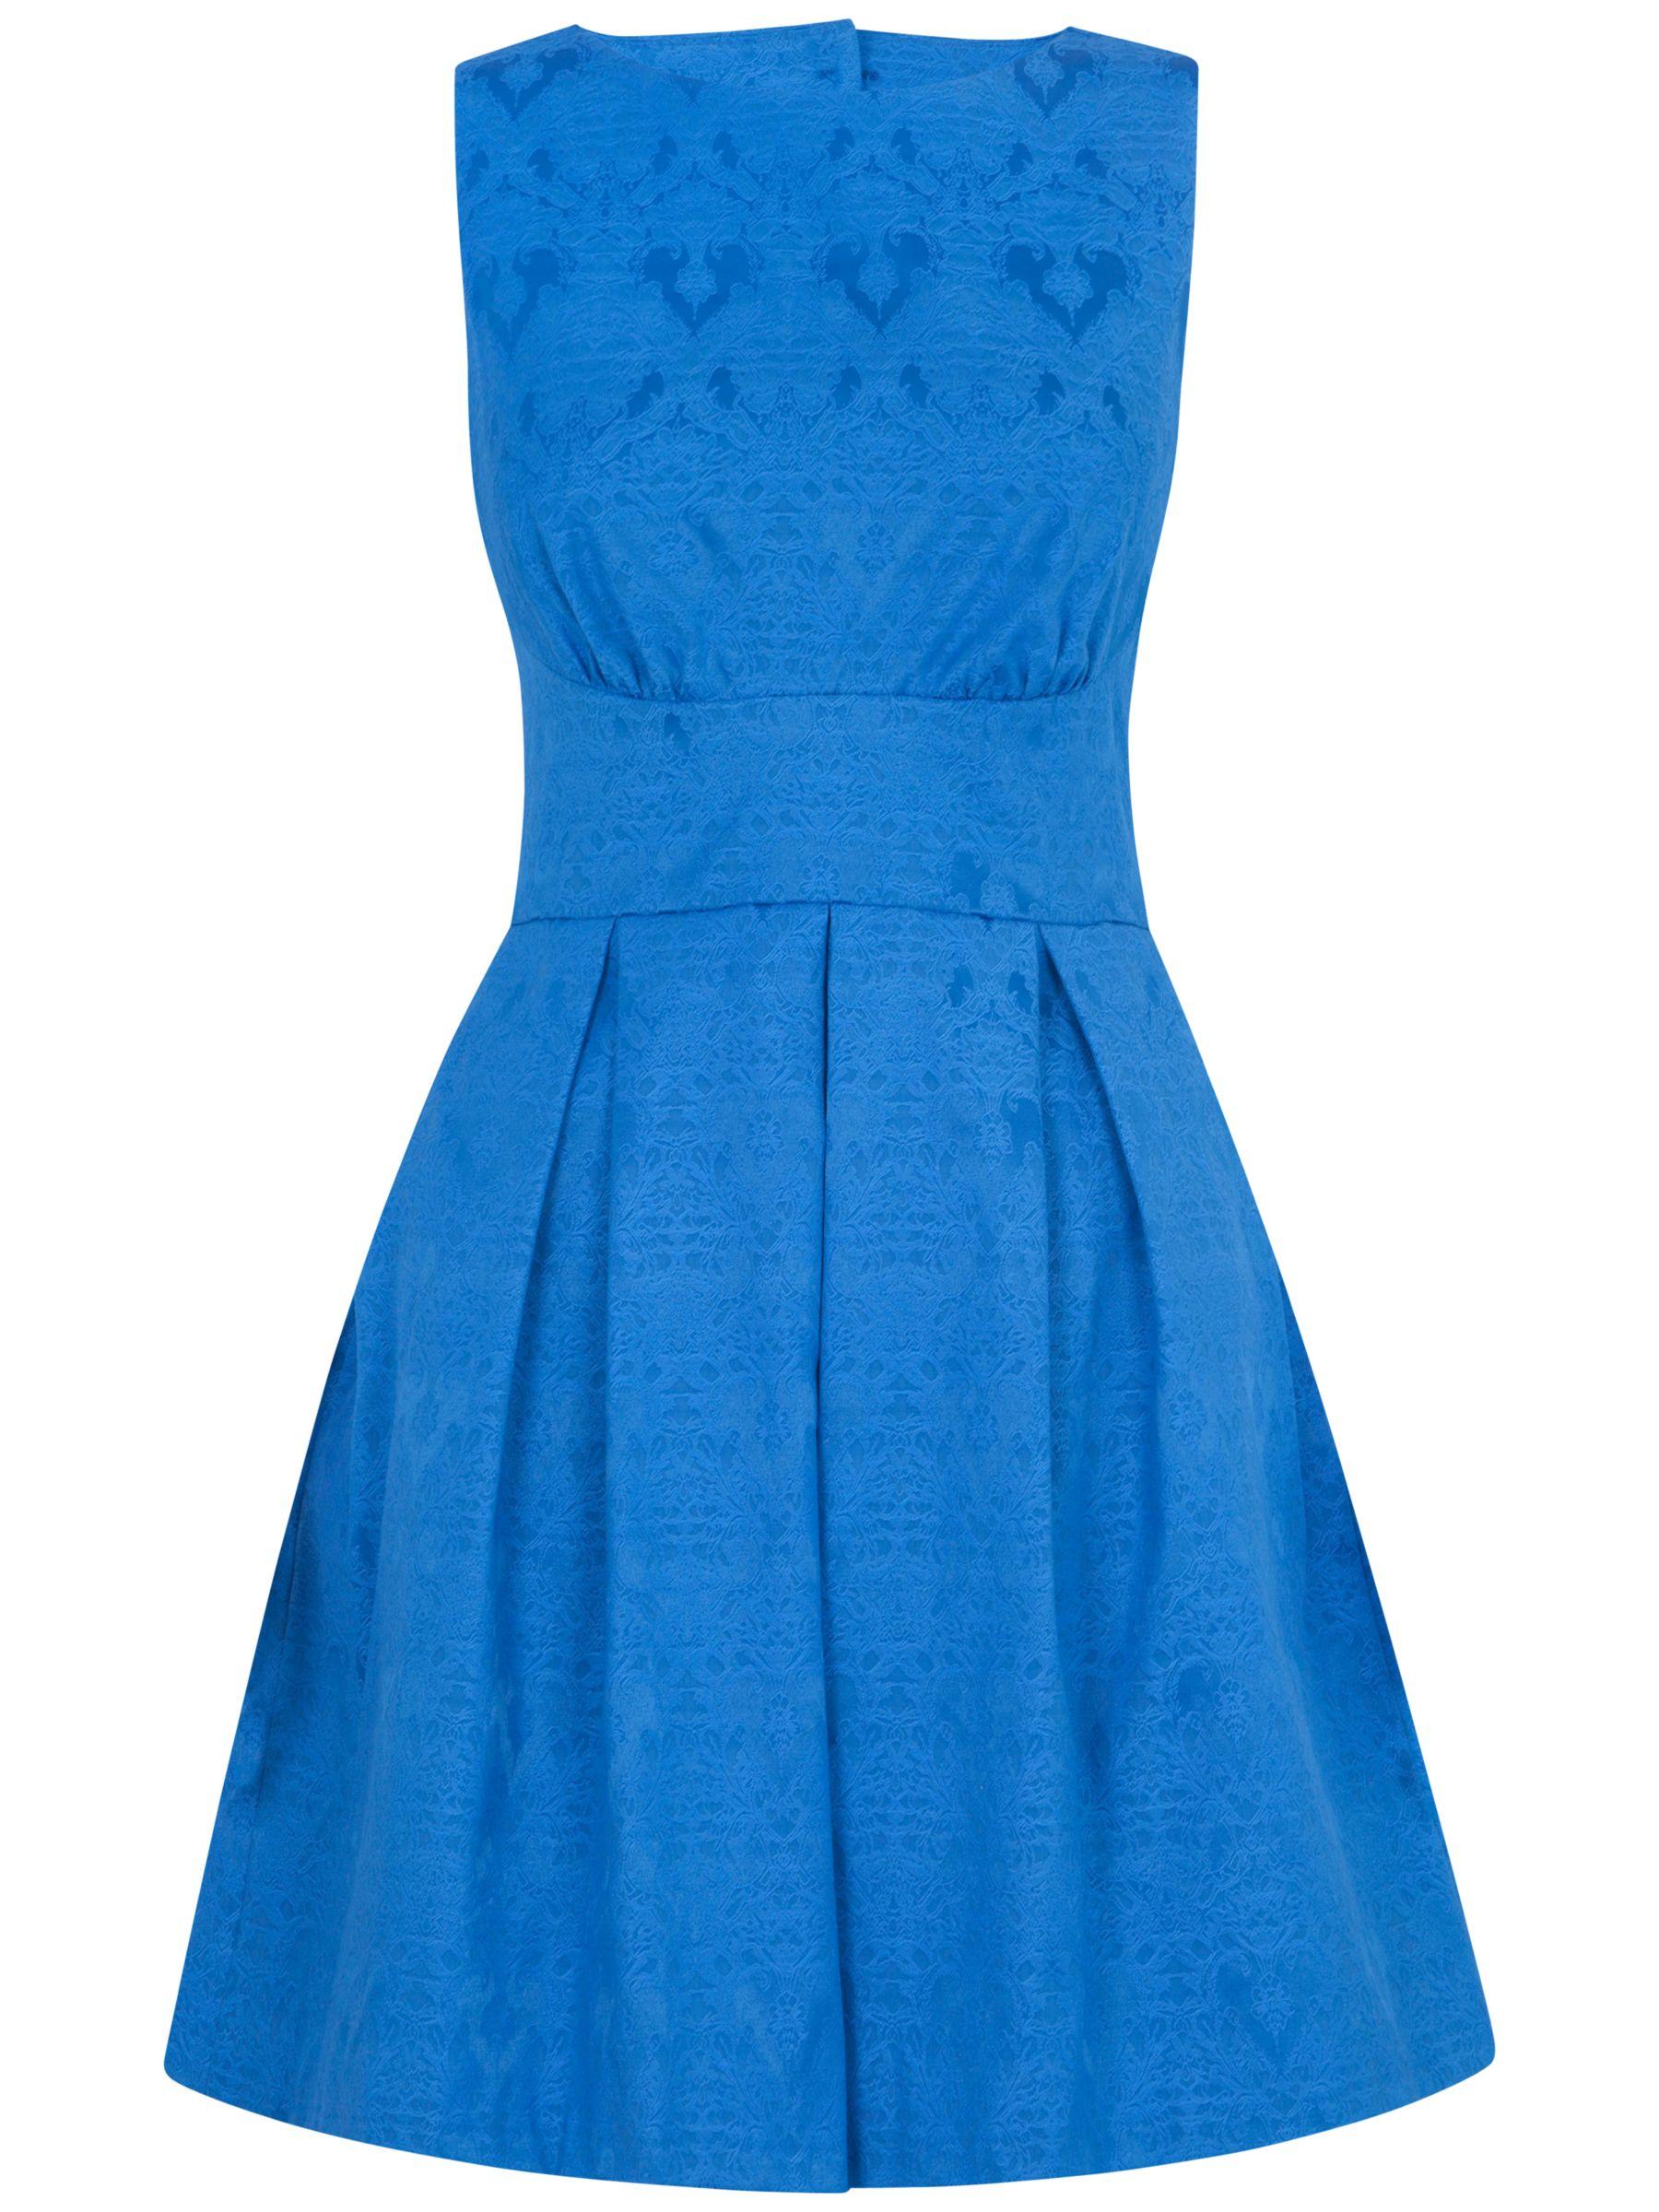 closet jacquard cut-out back dress blue, closet, jacquard, cut-out, back, dress, blue, 12|16|10|8, clearance, womenswear offers, womens dresses offers, women, womens dresses, special offers, inactive womenswear, aw14 trends, pillar box, 1621543